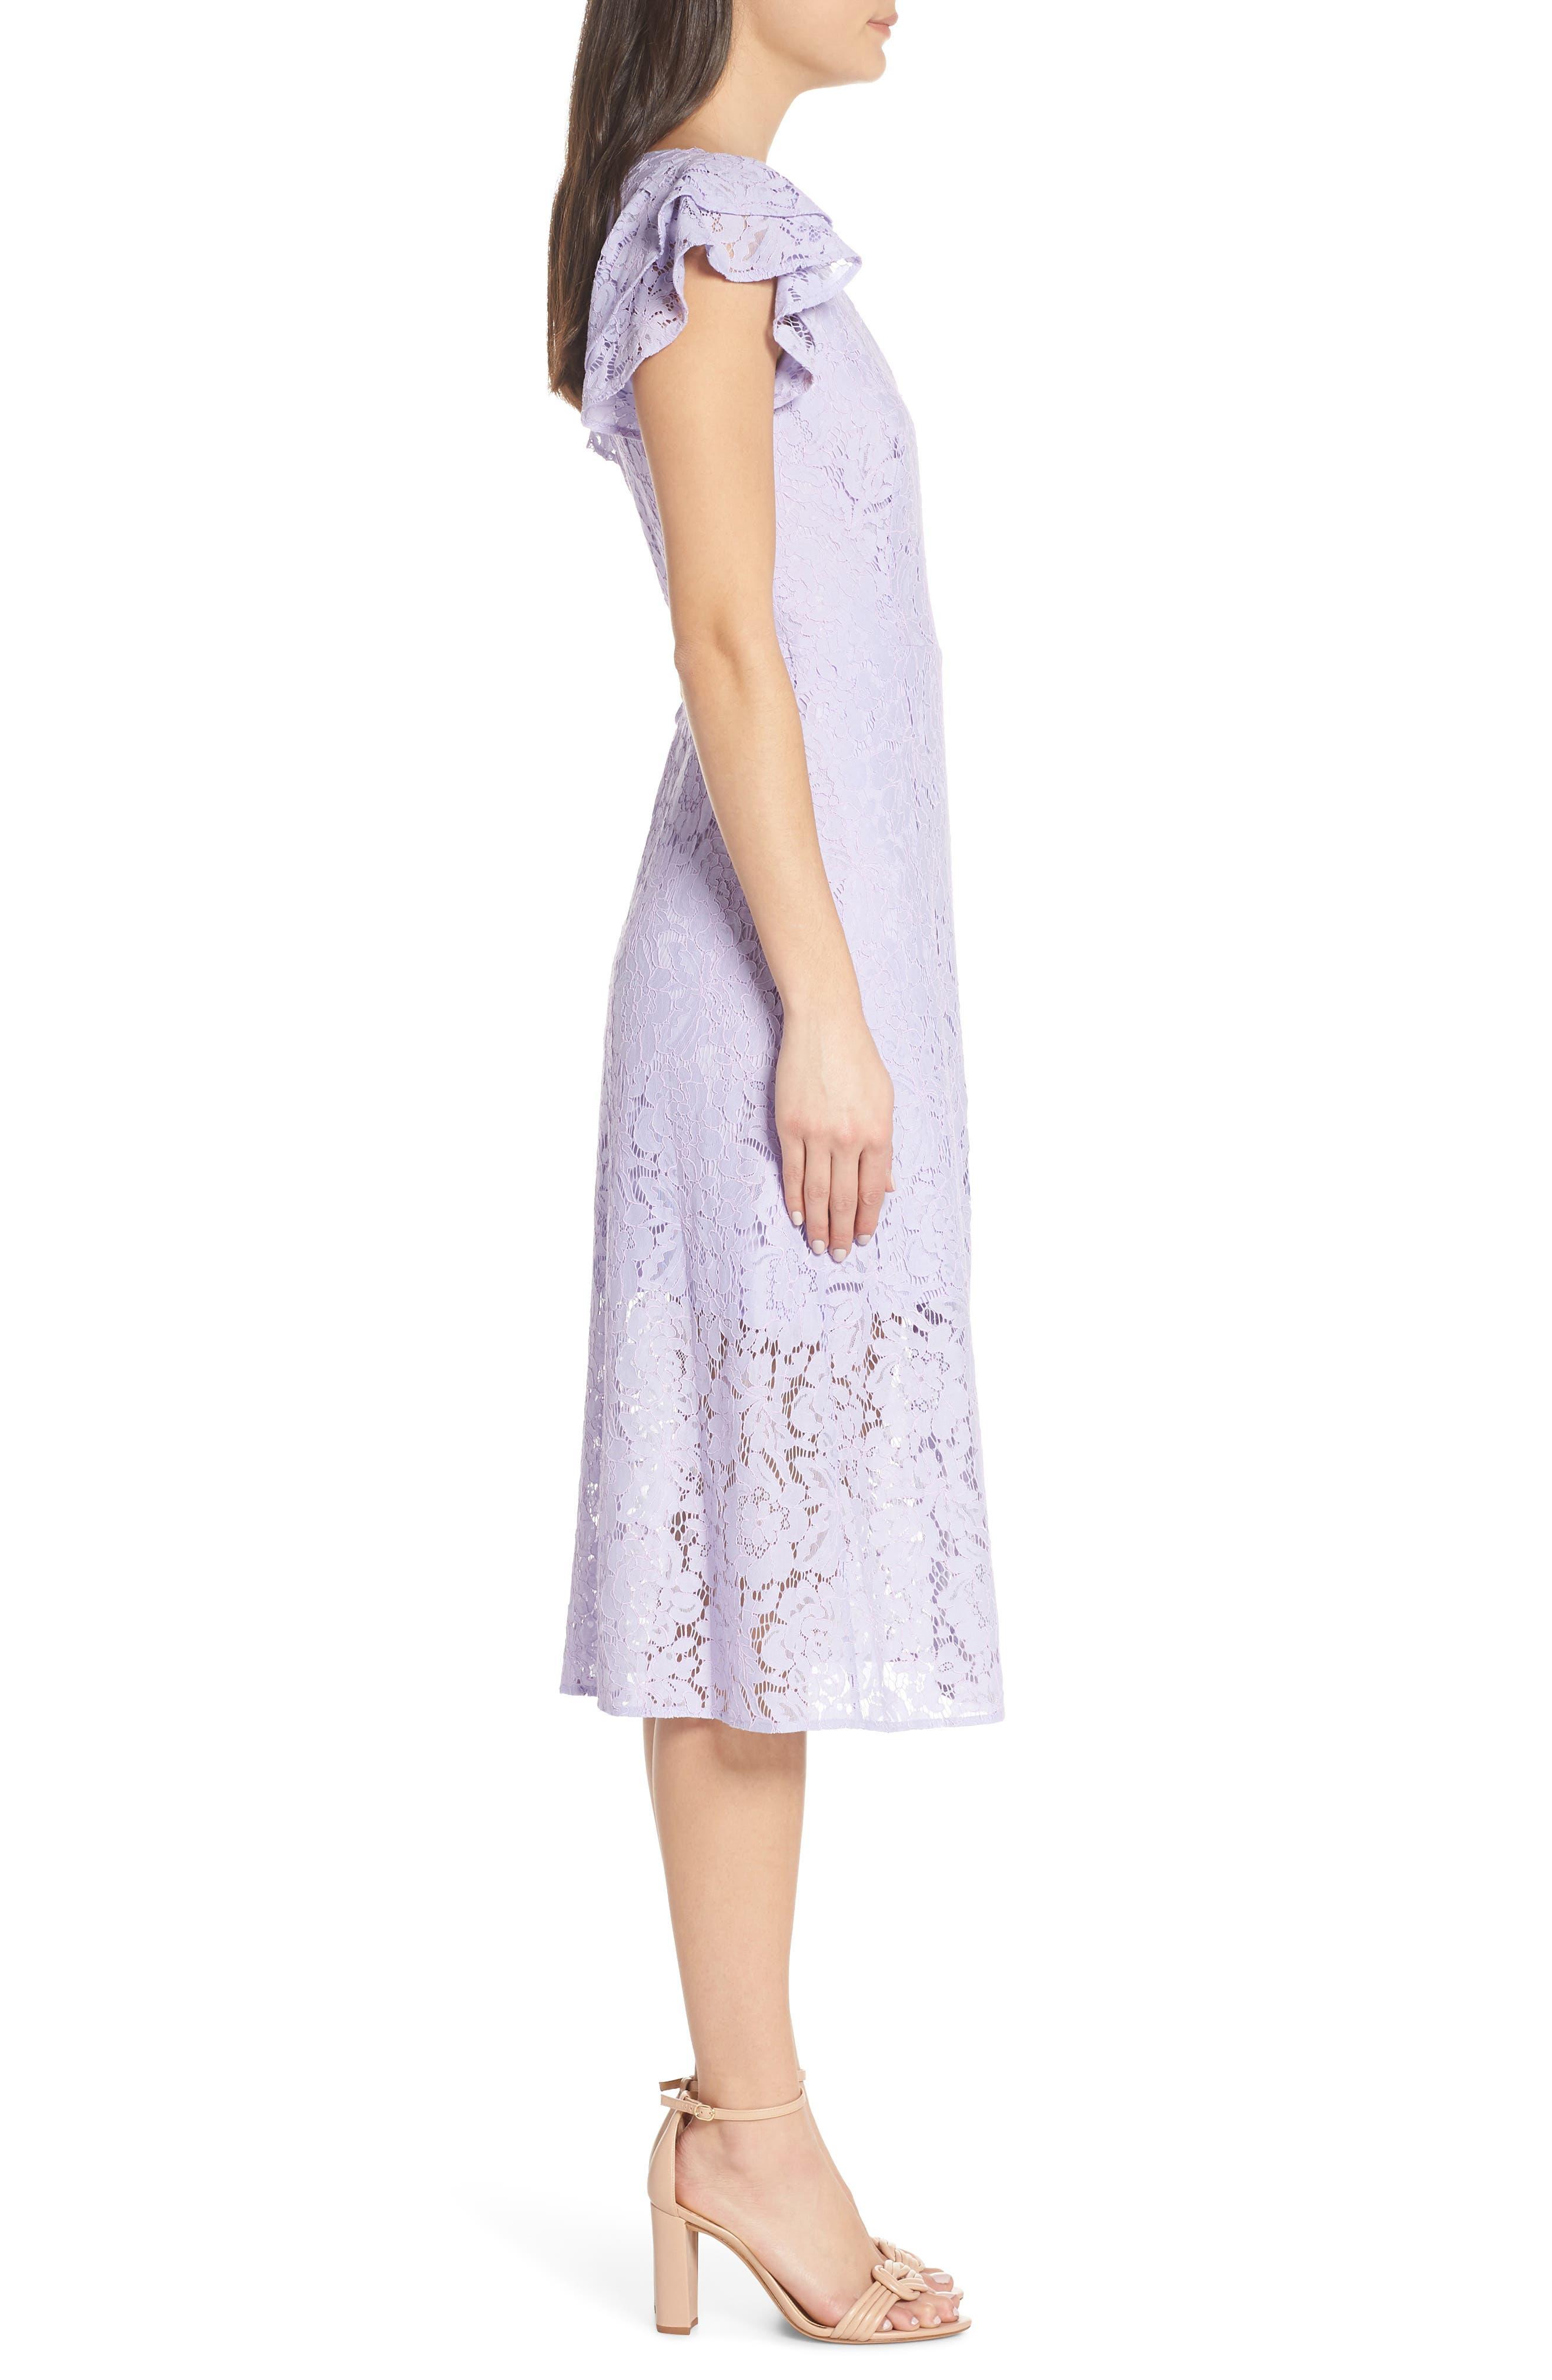 ALI & JAY, Ruffle Sleeve Wrap Lace Midi Dress, Alternate thumbnail 4, color, LAVENDER